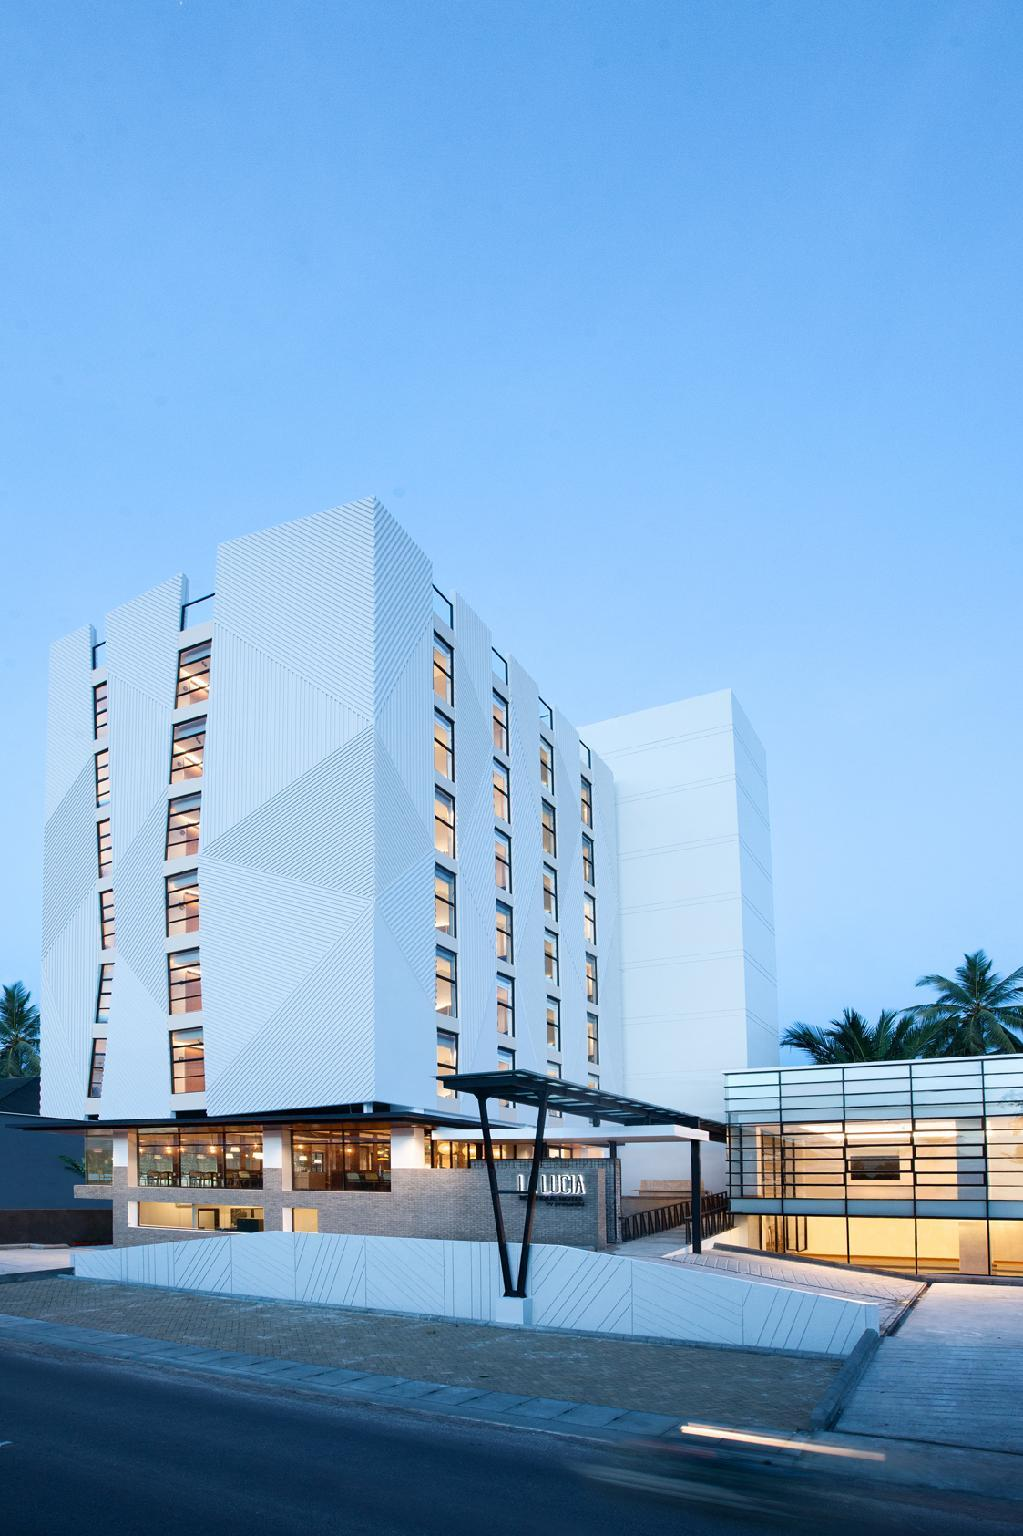 La Lucia Boutique Hotel By Prasanthi